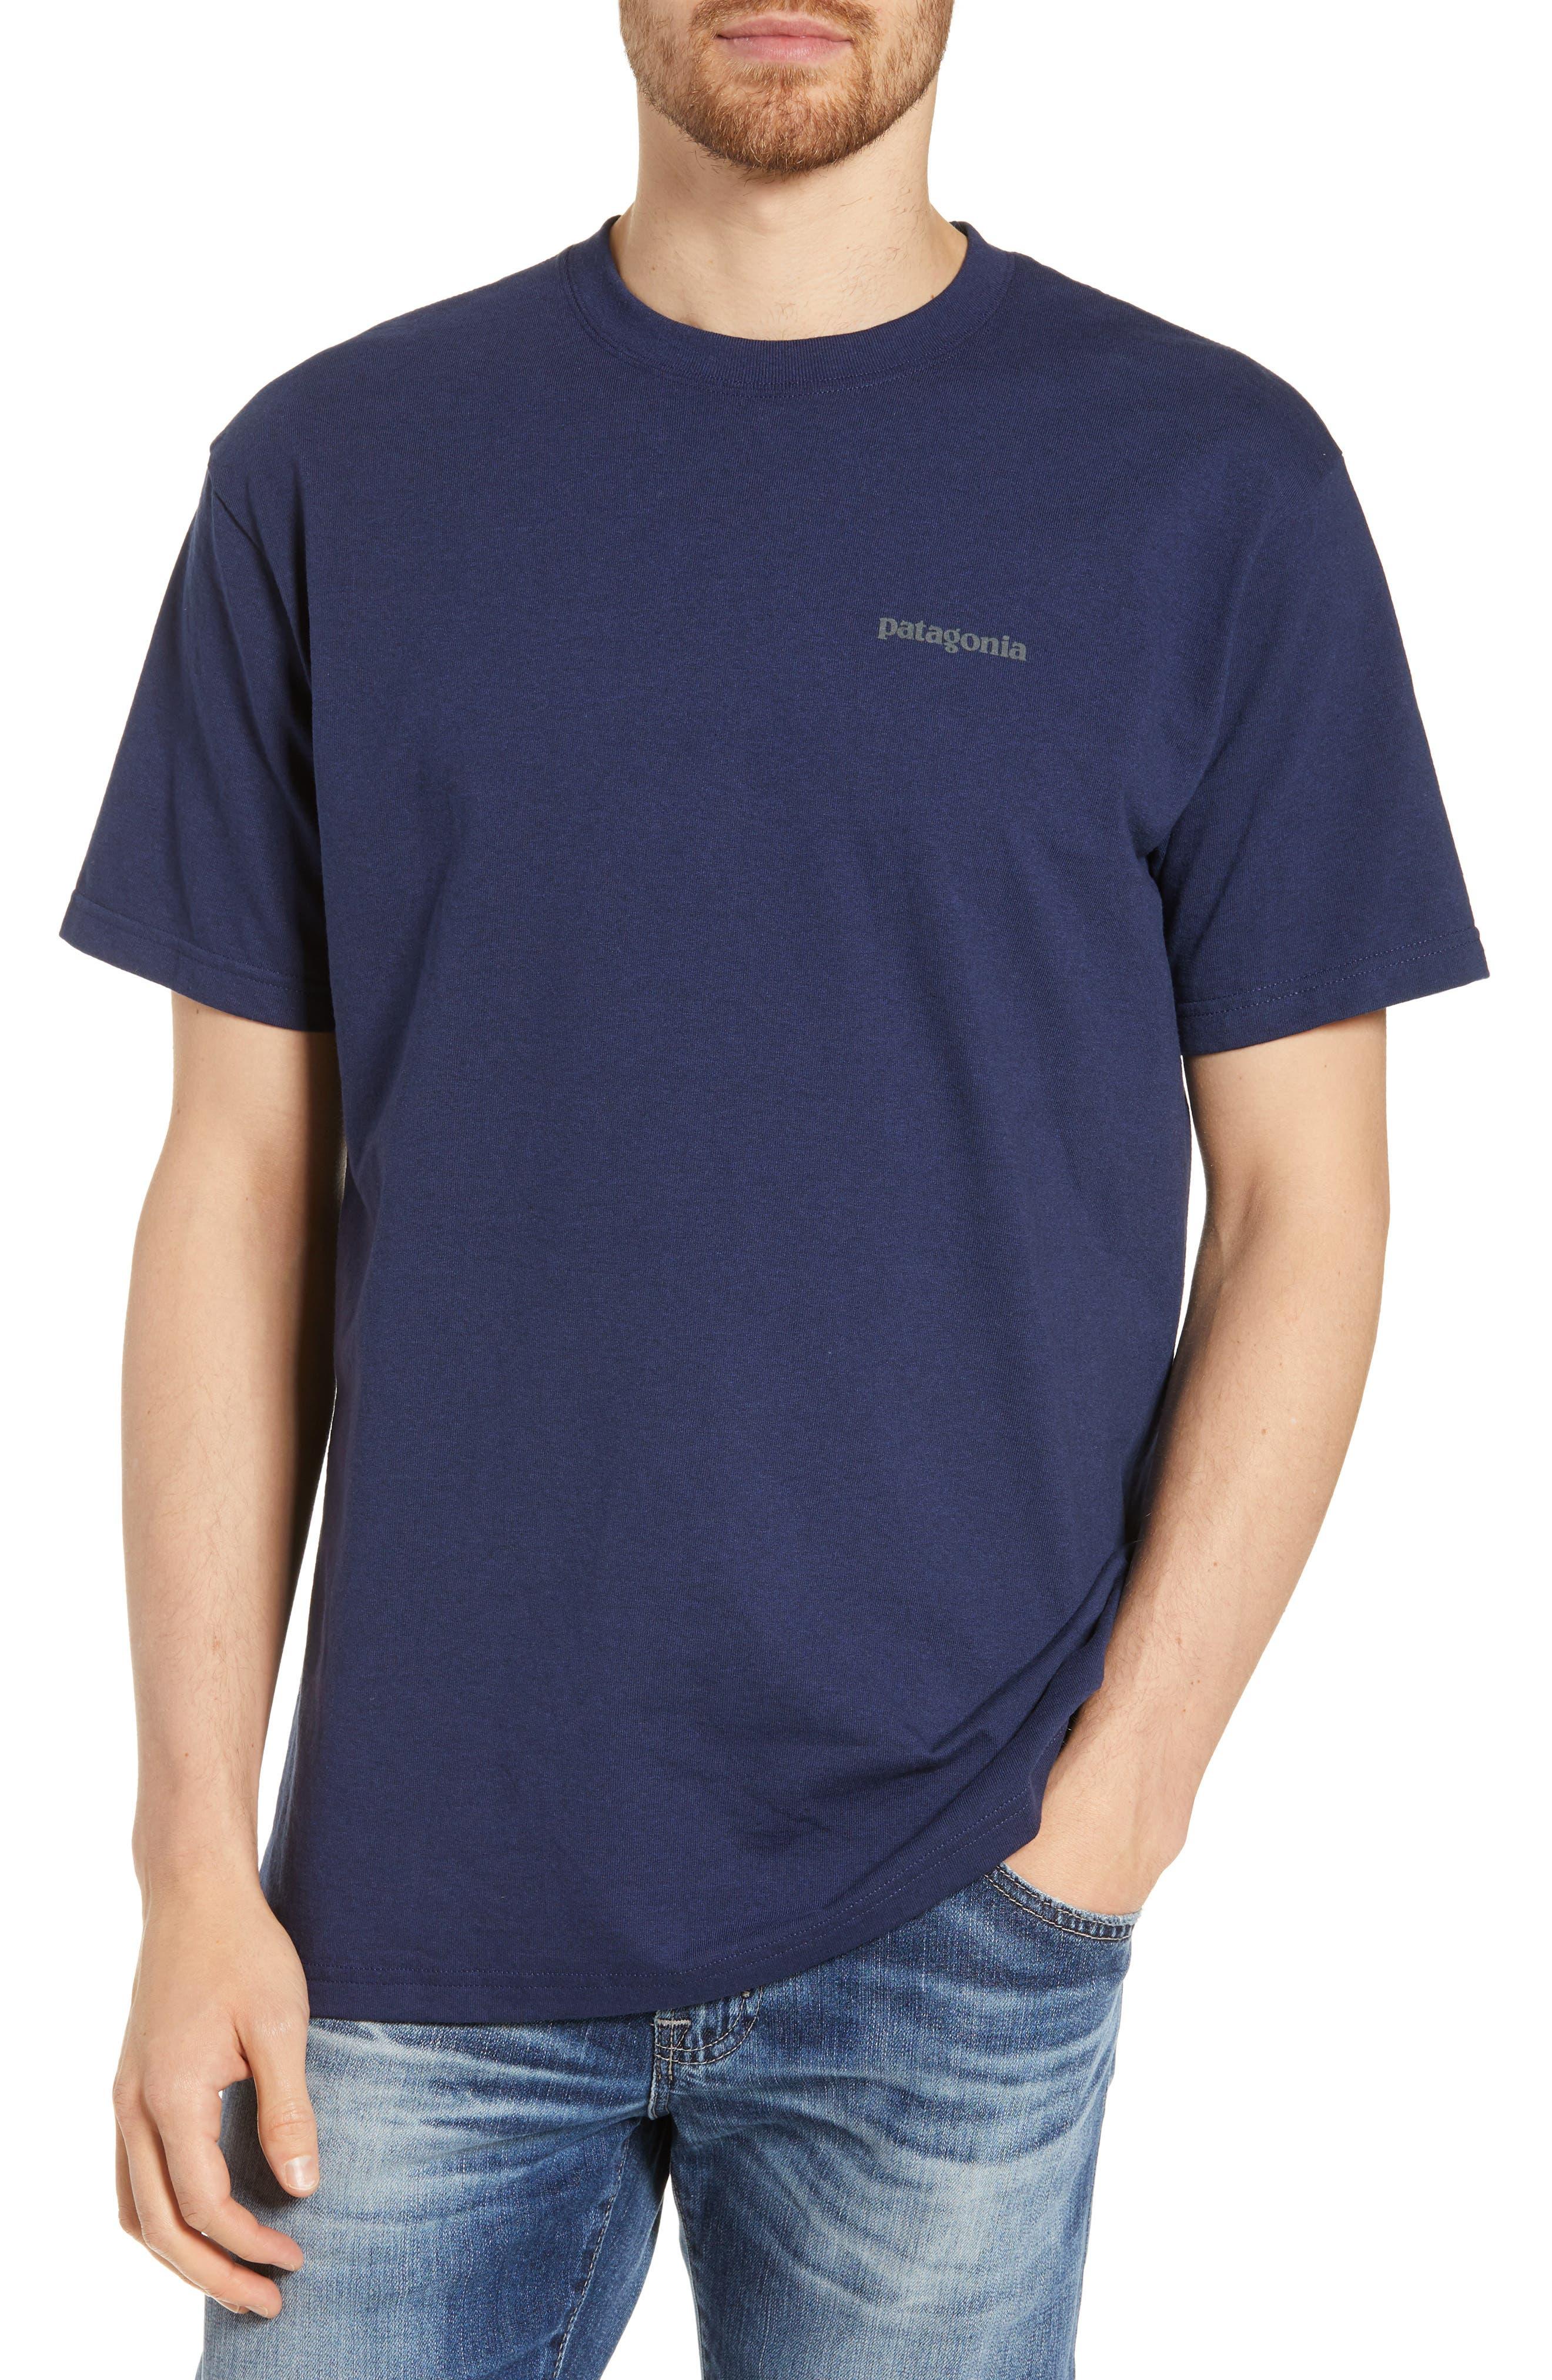 Patagonia Fitz Roy Smallmouth Responsibili-Tee T-Shirt, Blue